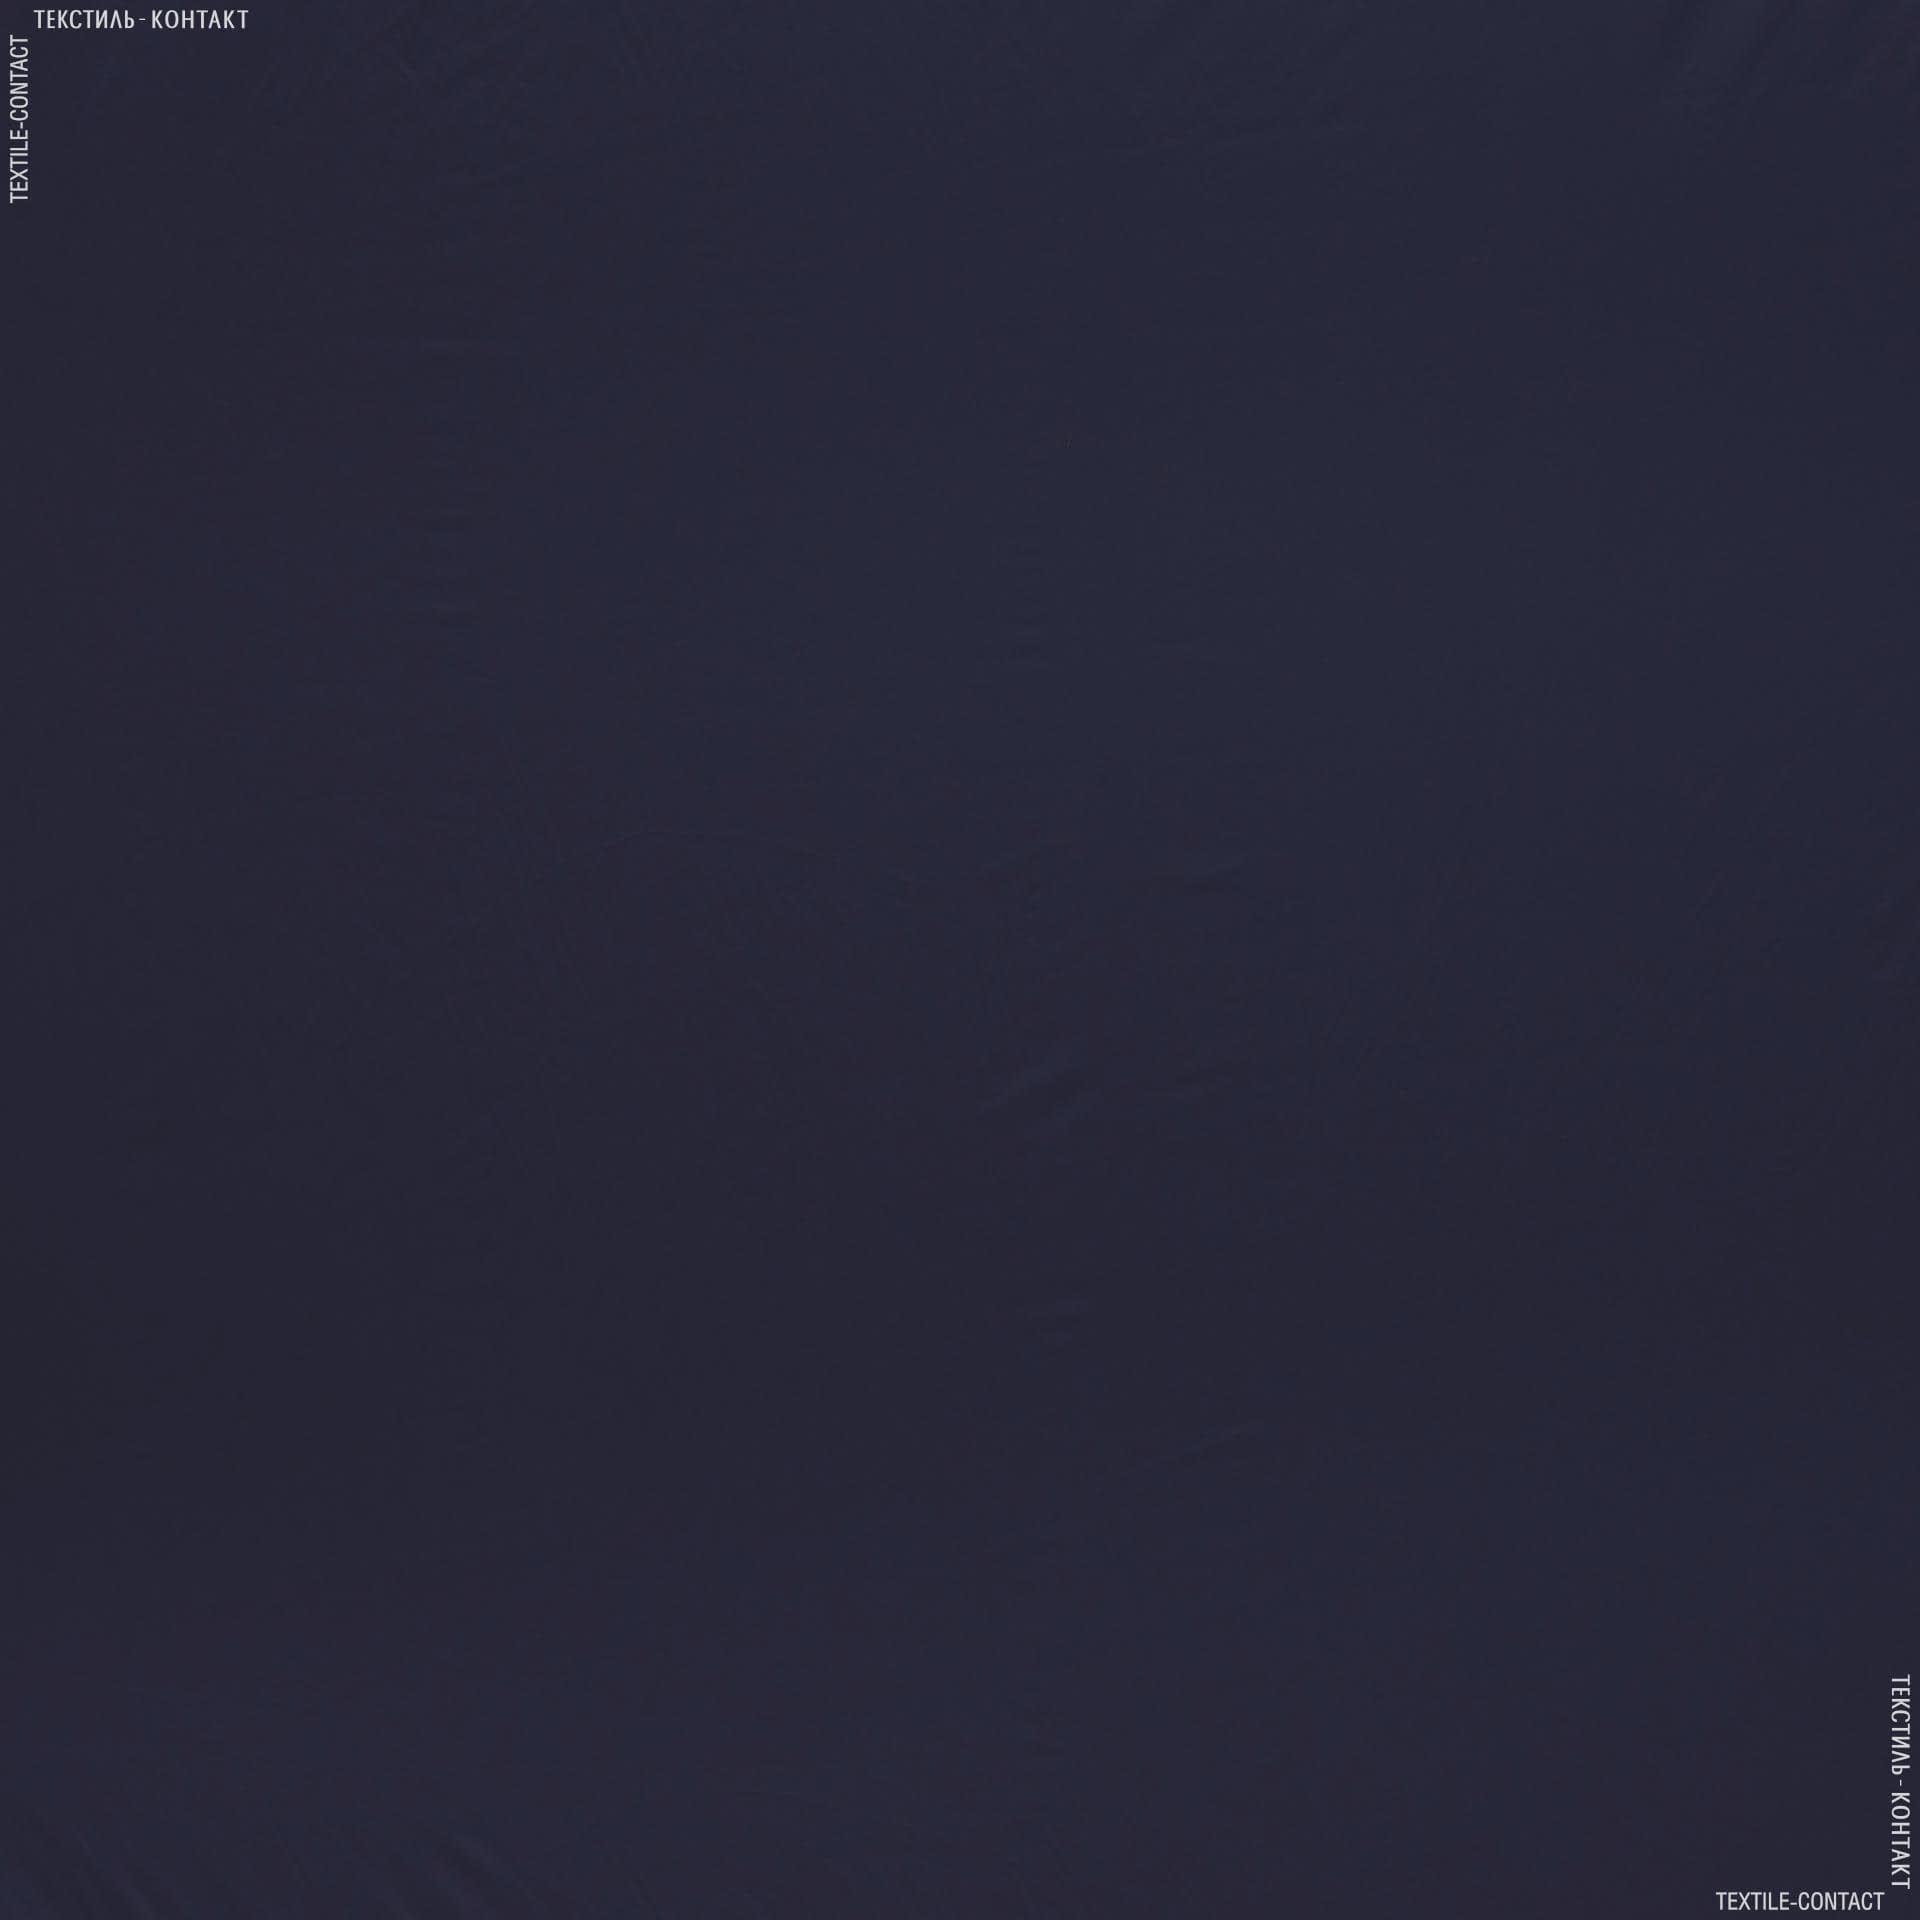 Ткани для палаток - Плащевая лаке нейлон темно-синий